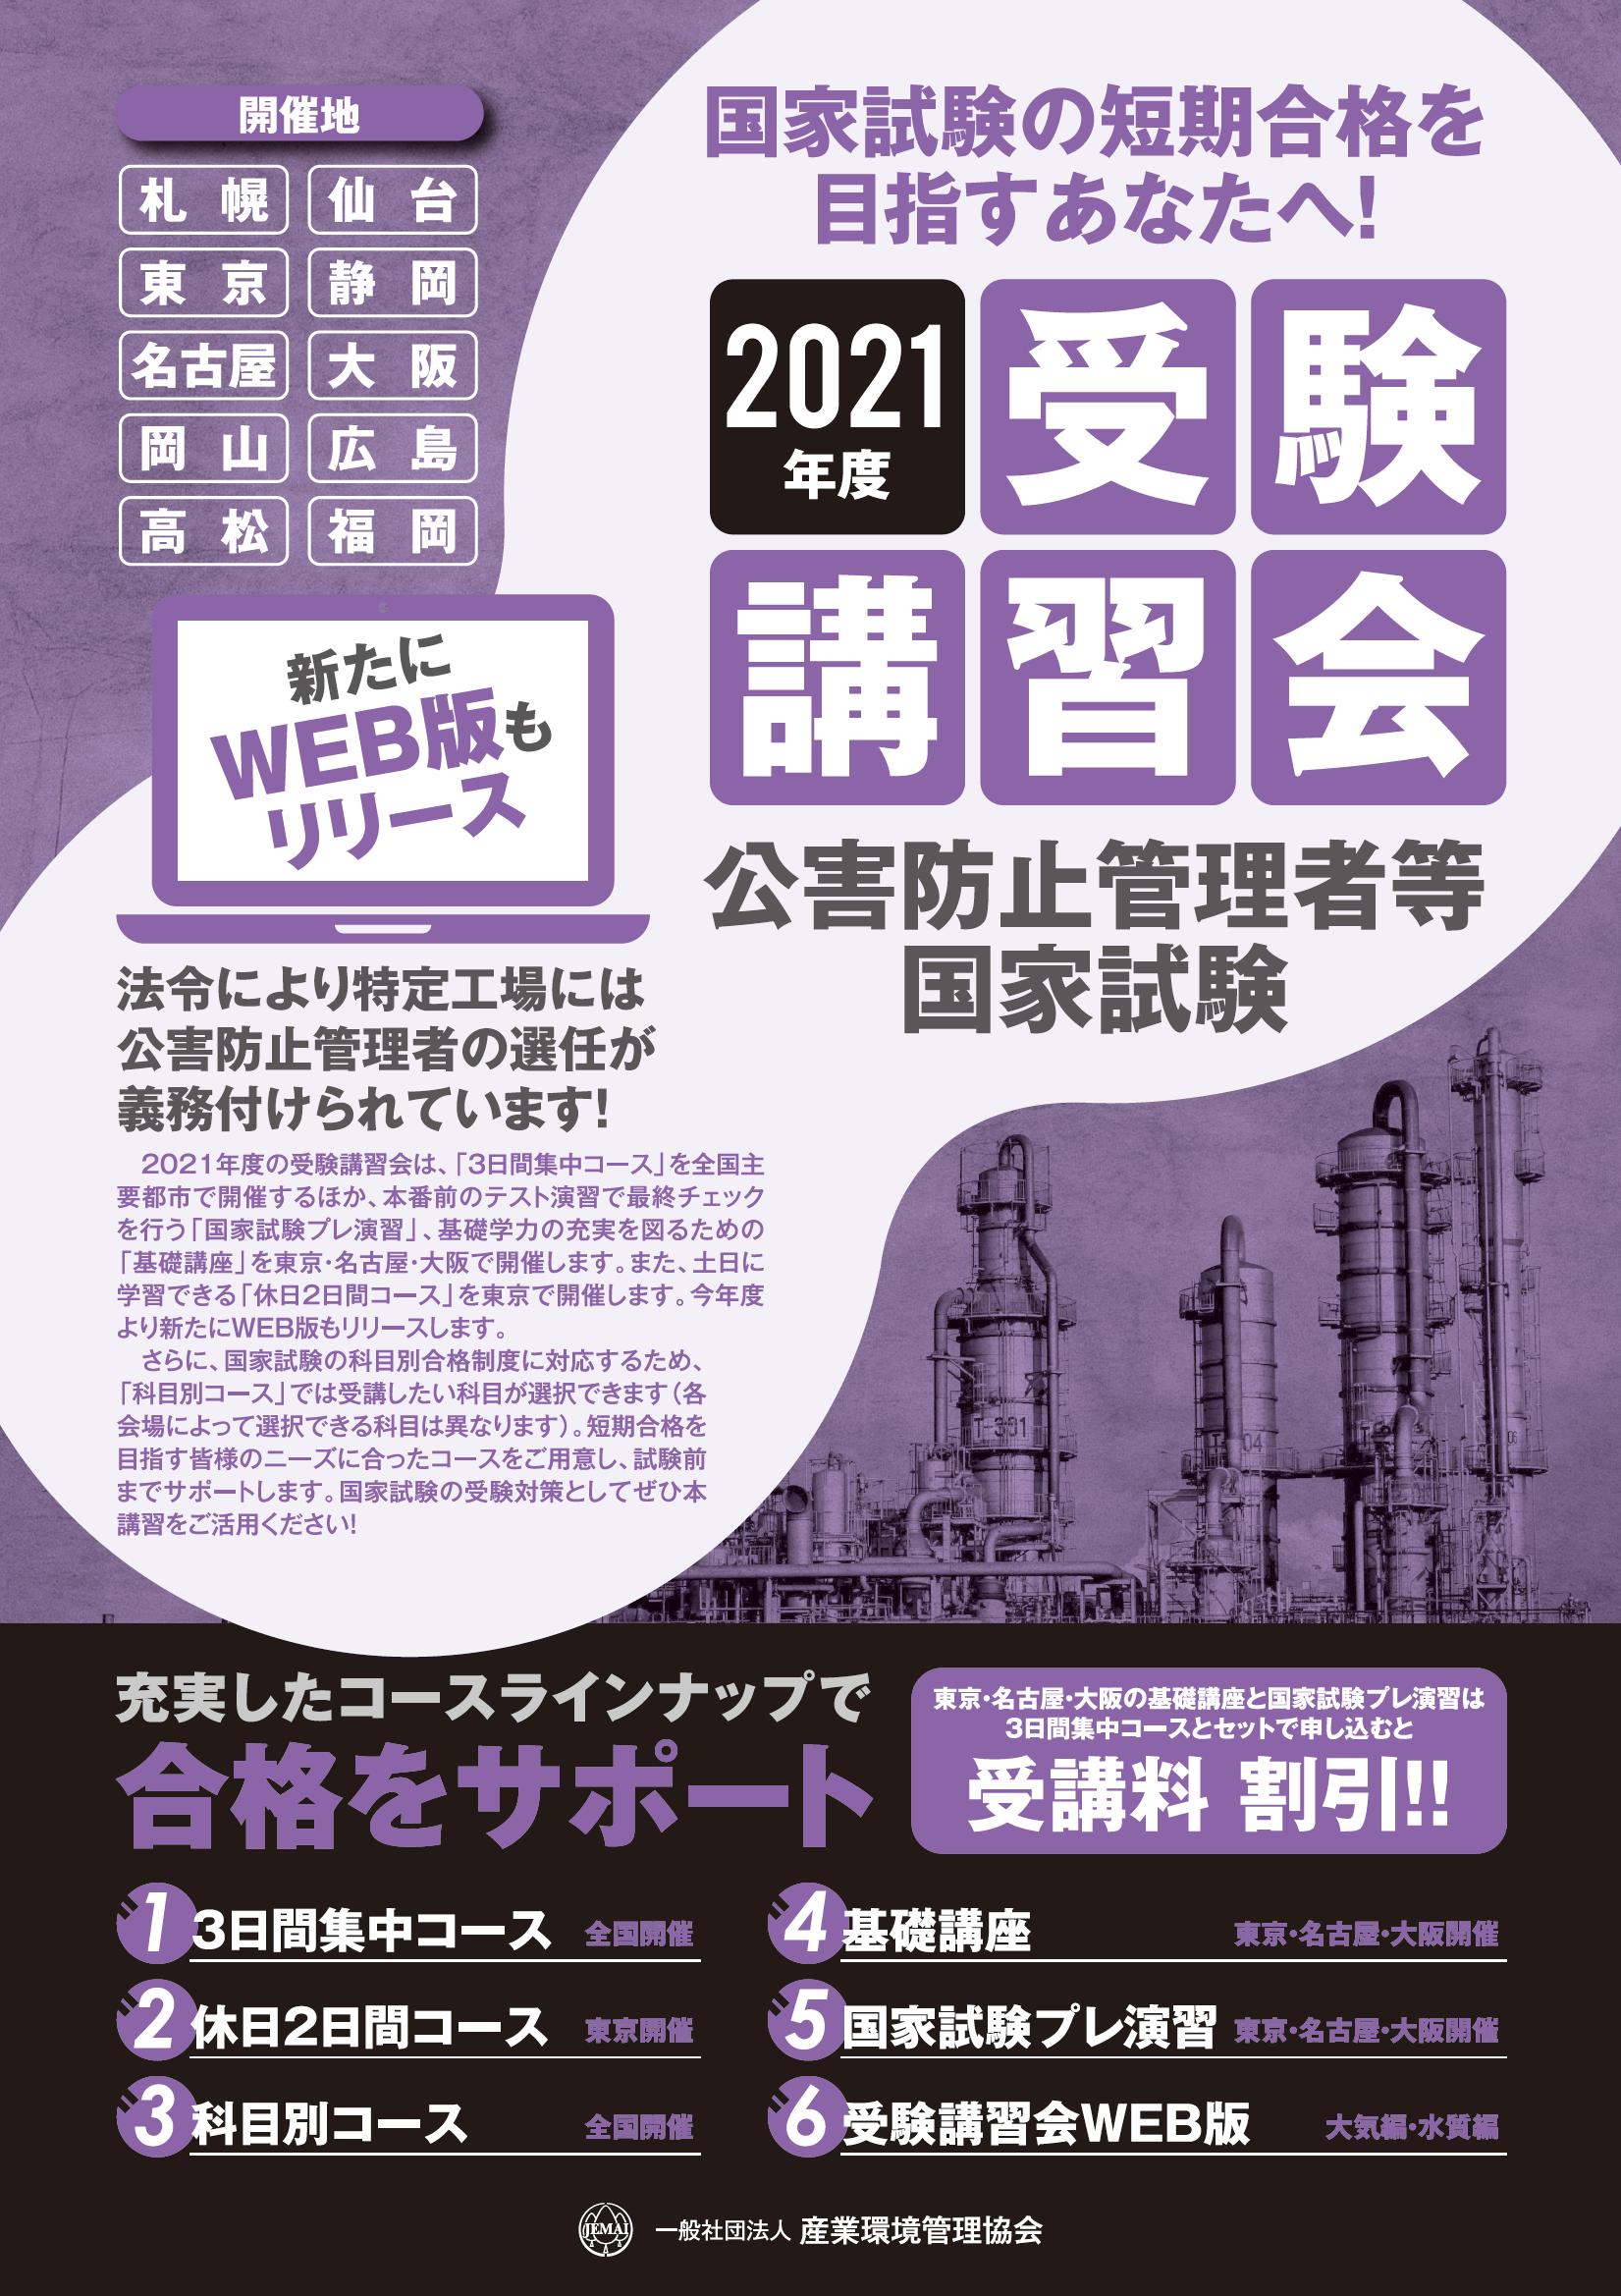 pamphlet01_2021.png